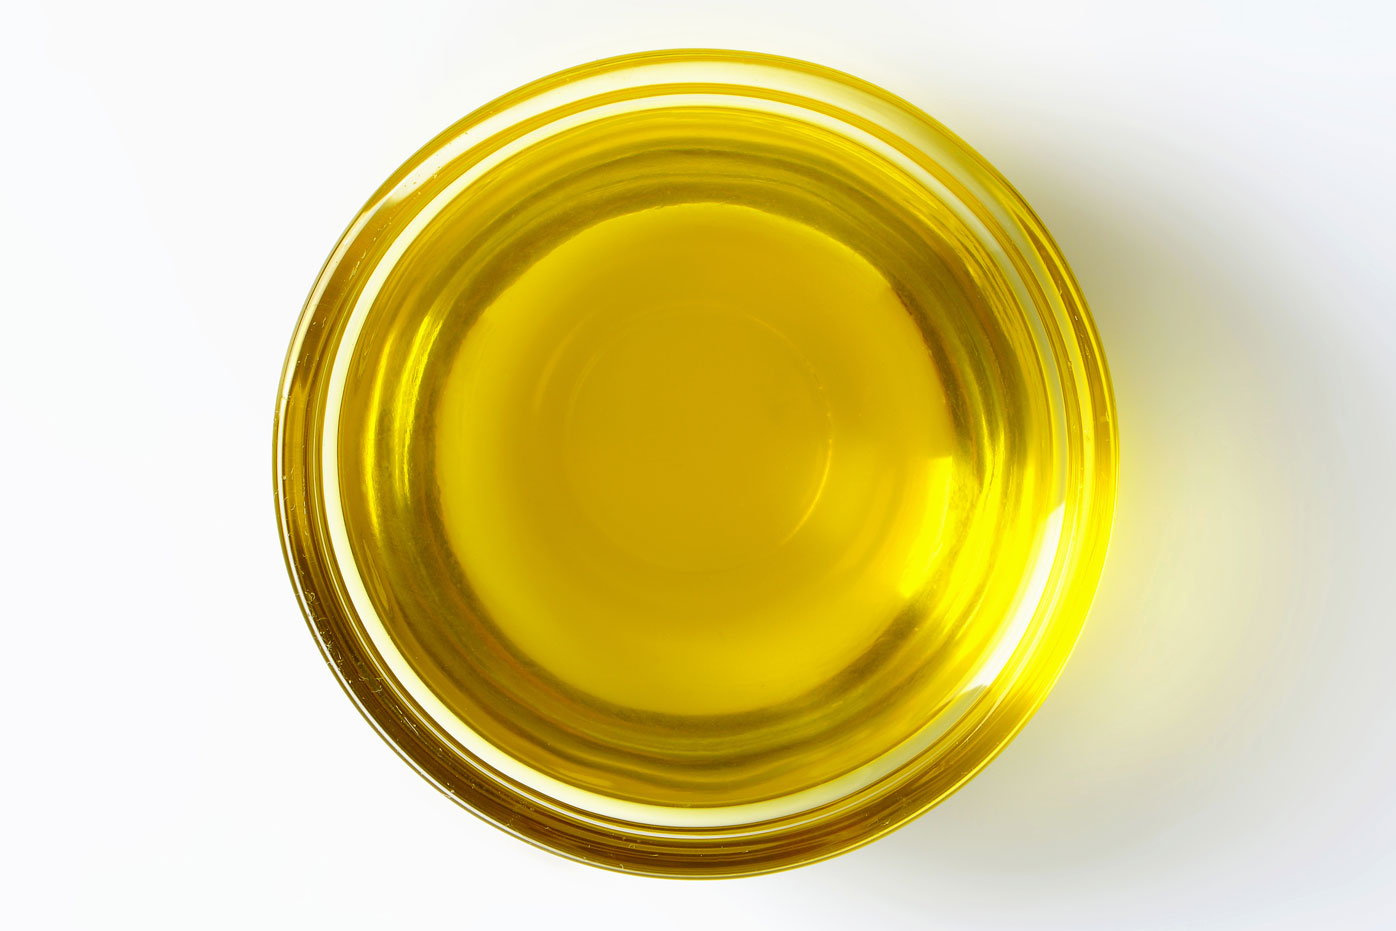 Eat: Extra virgin olive oil